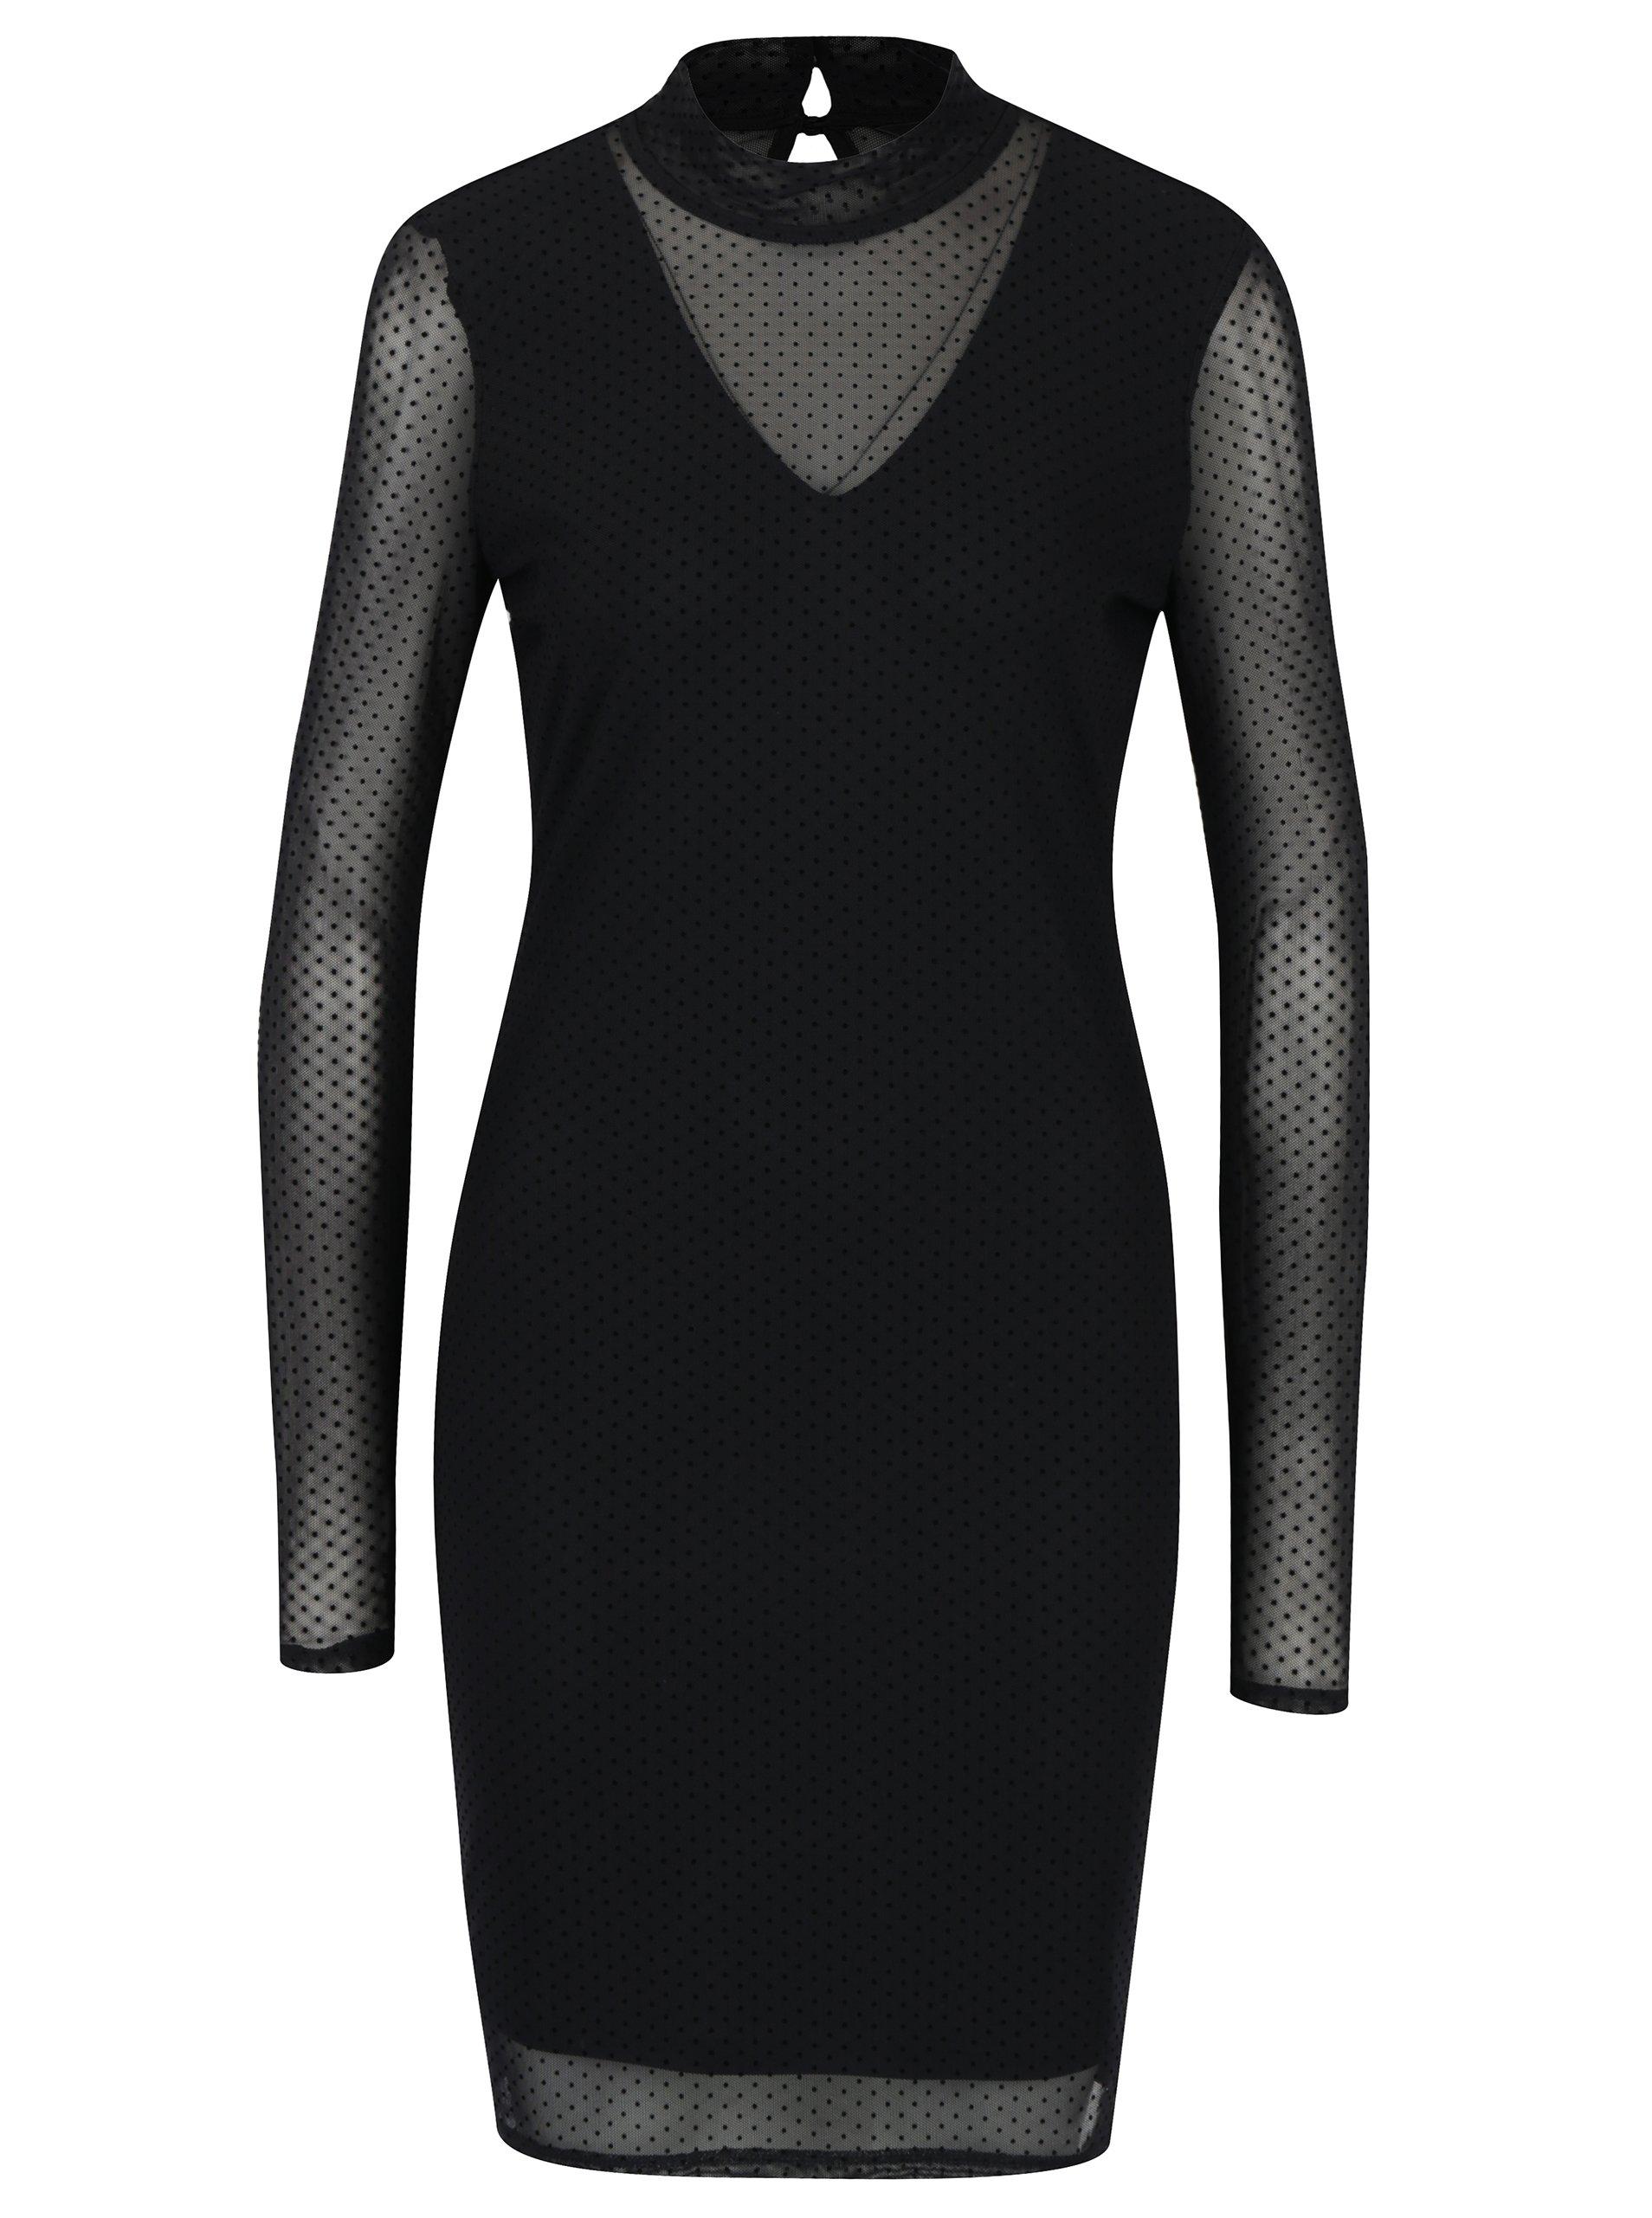 Černé puntíkované šaty s dlouhým rukávem VERO MODA Kira